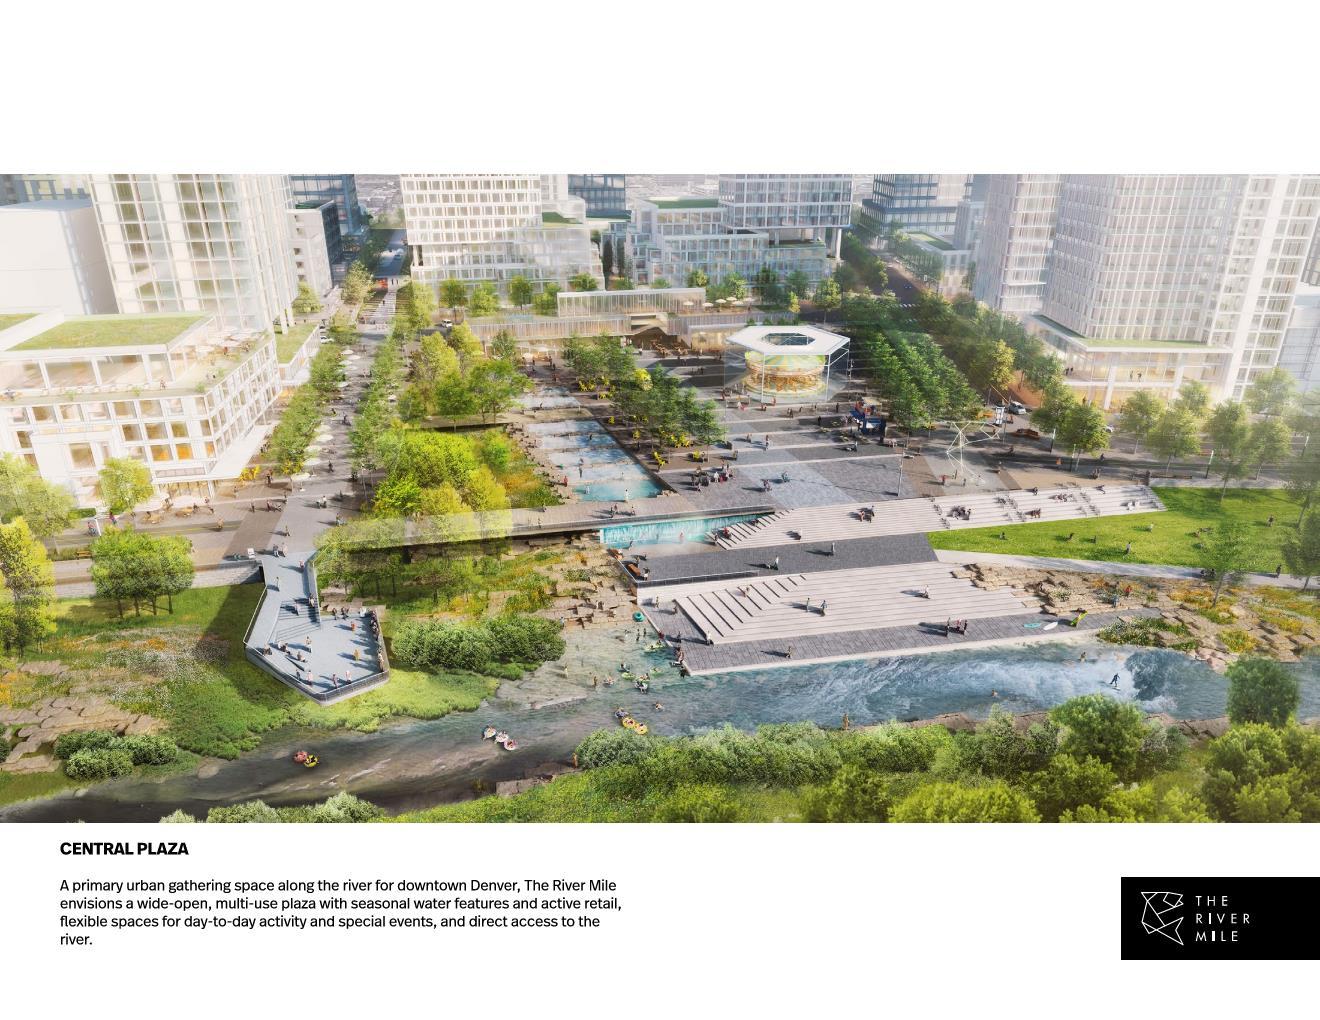 The River Mile Central Plaza